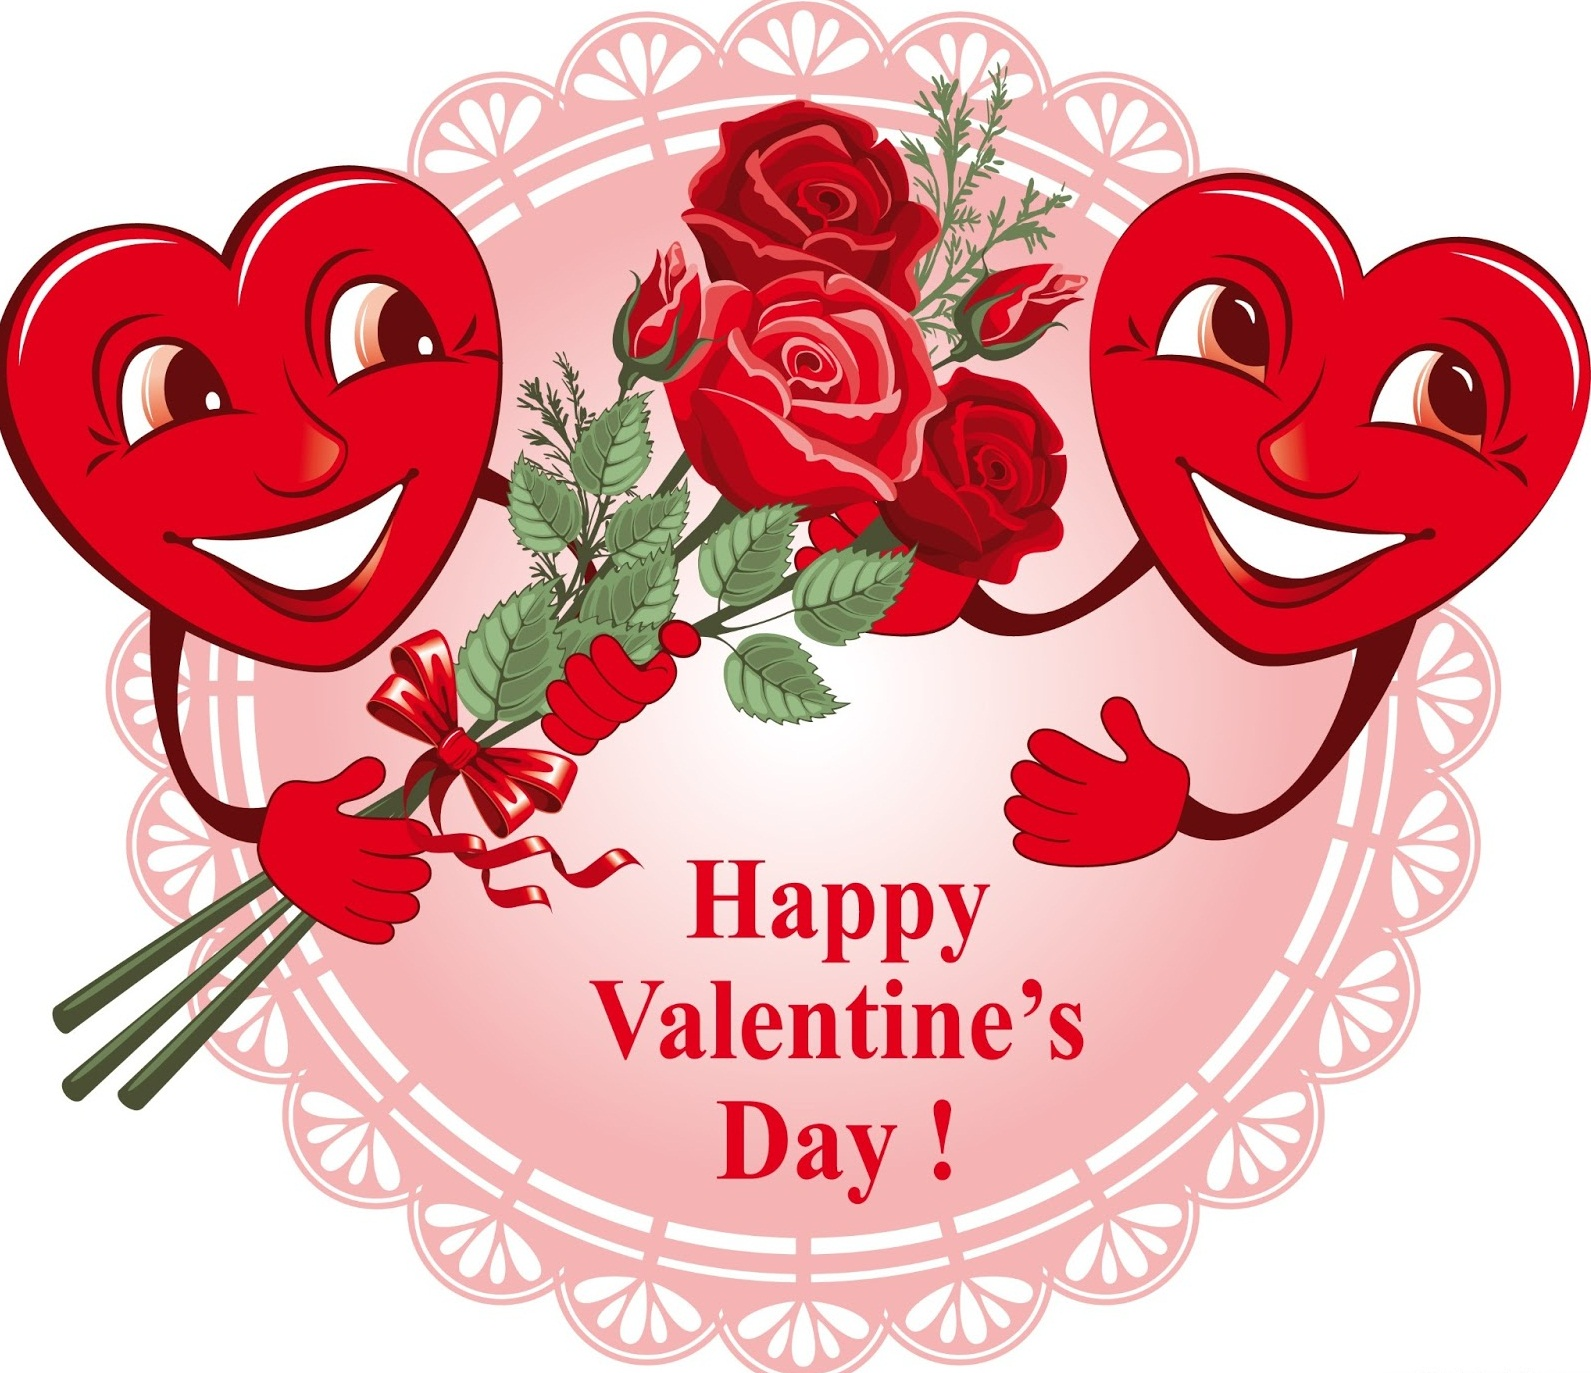 Valentines Day Free Valentine .-Valentines Day Free Valentine .-13